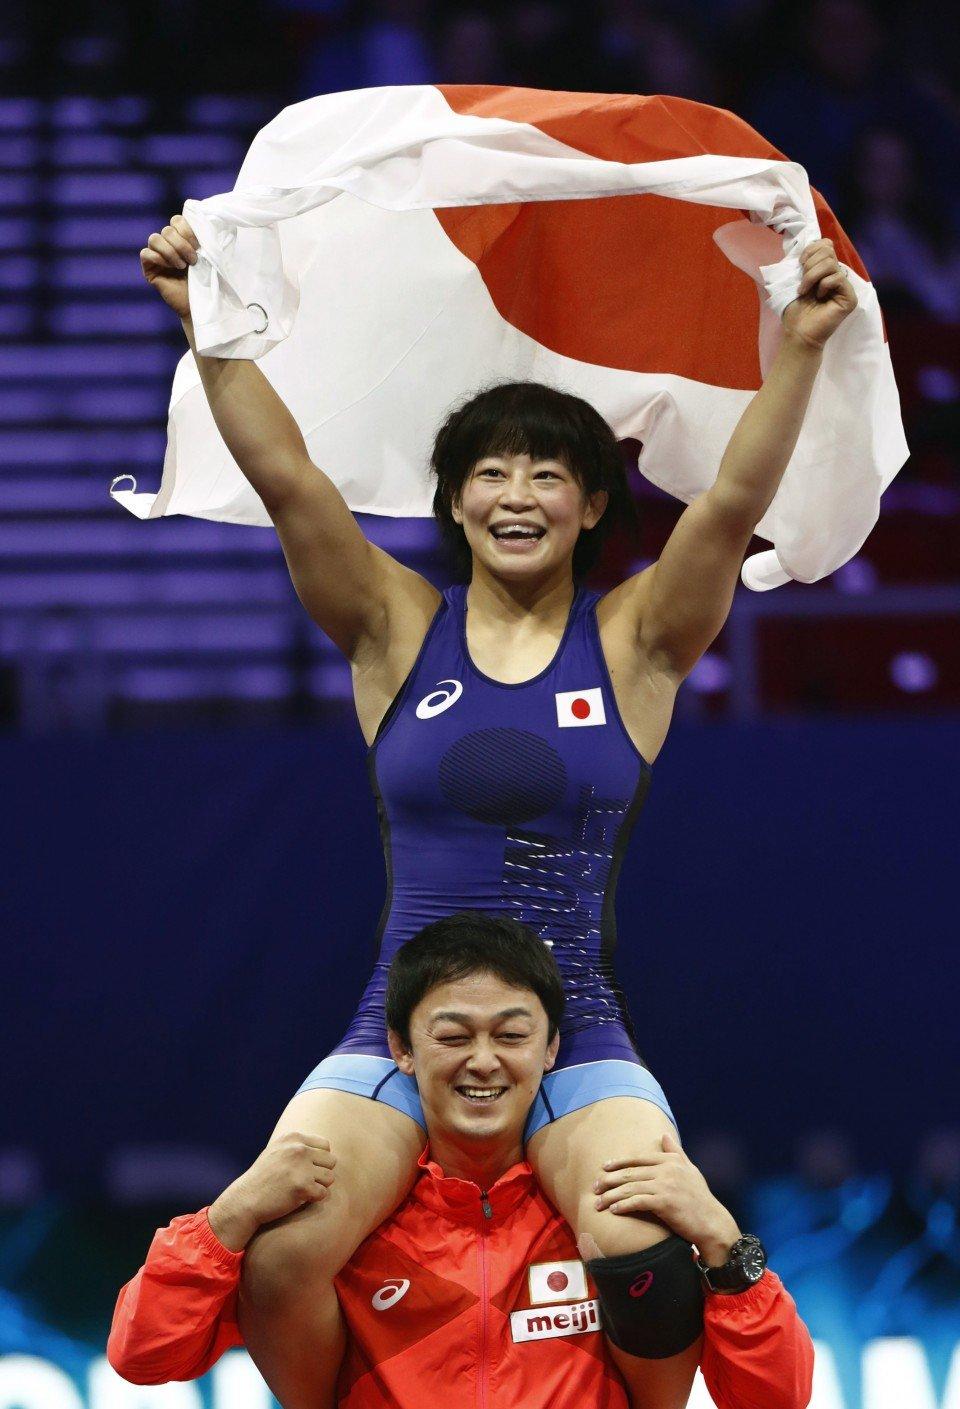 Coronavirus crashes Olympic party for wrestler-coach couple